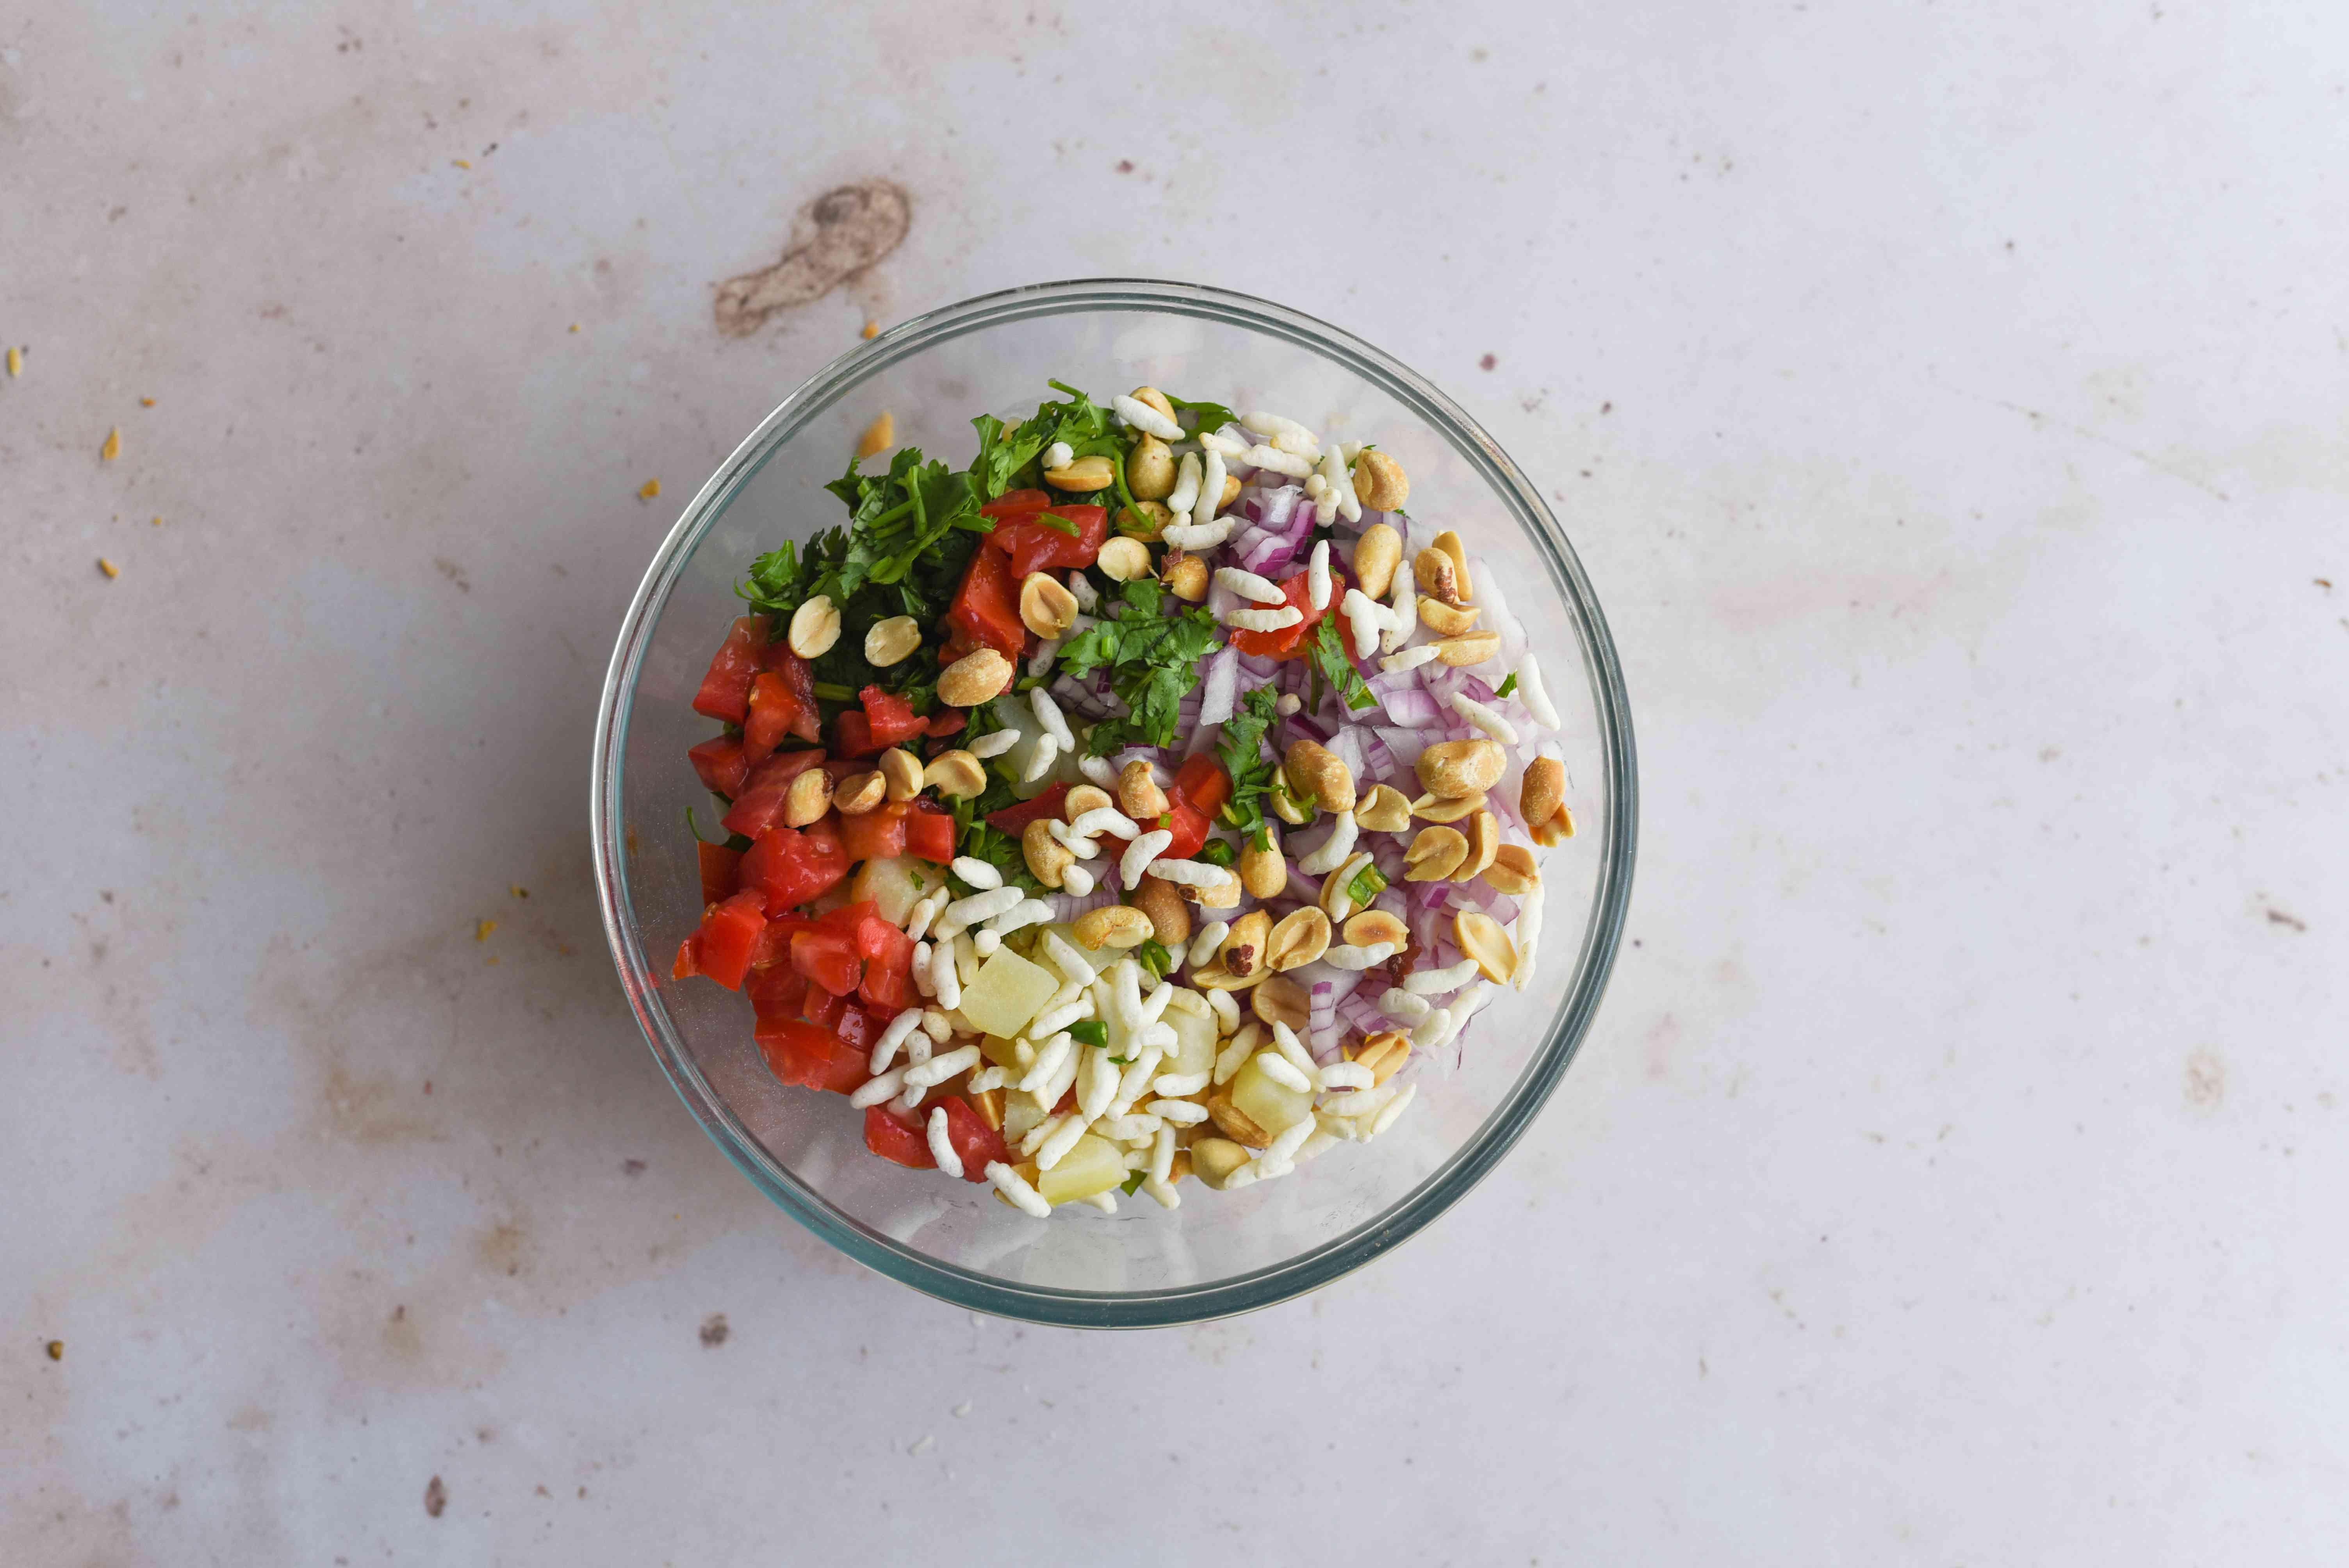 Mix the puffed rice, peanuts, potato, onion, tomato, coriander, and green chilies